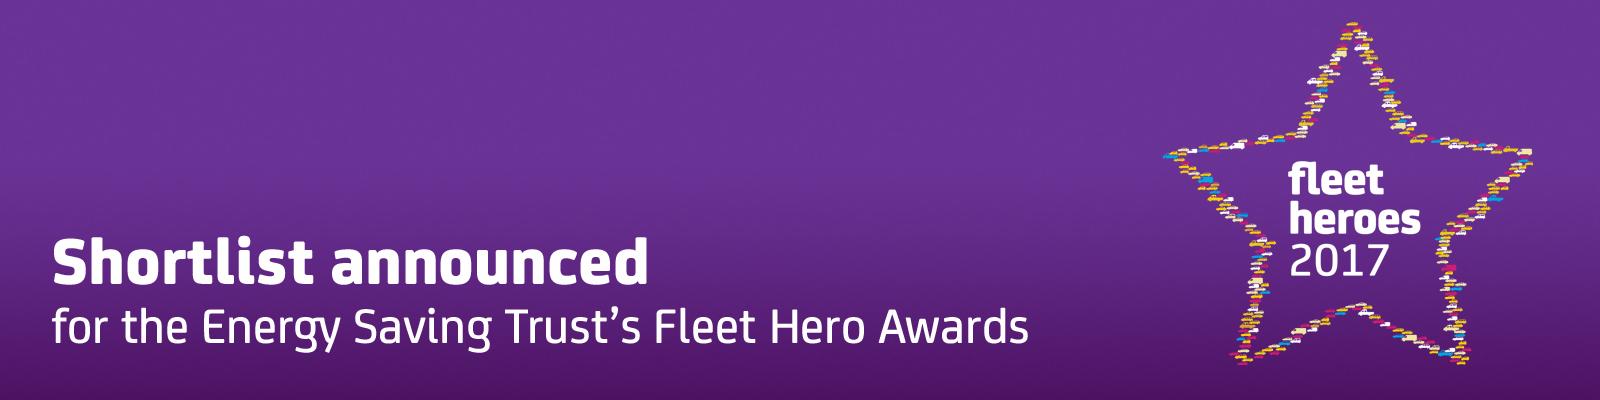 Fleet Hero Awards 2017 shortlist